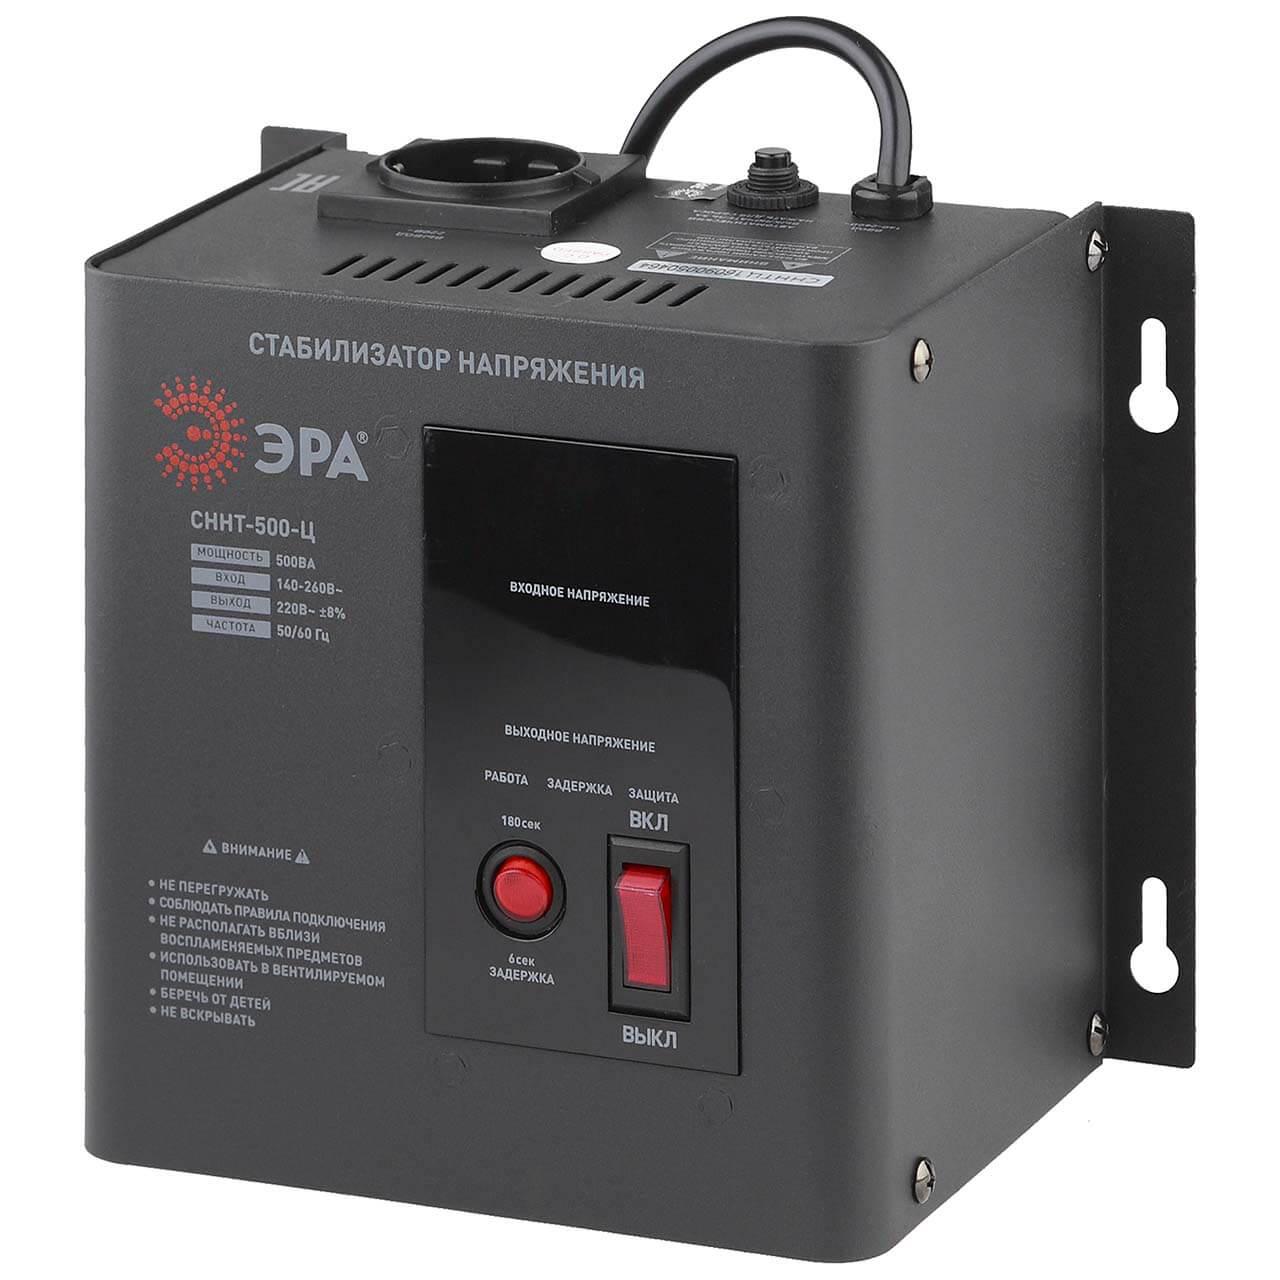 Стабилизатор напряжения ЭРА СННТ-500-Ц цена